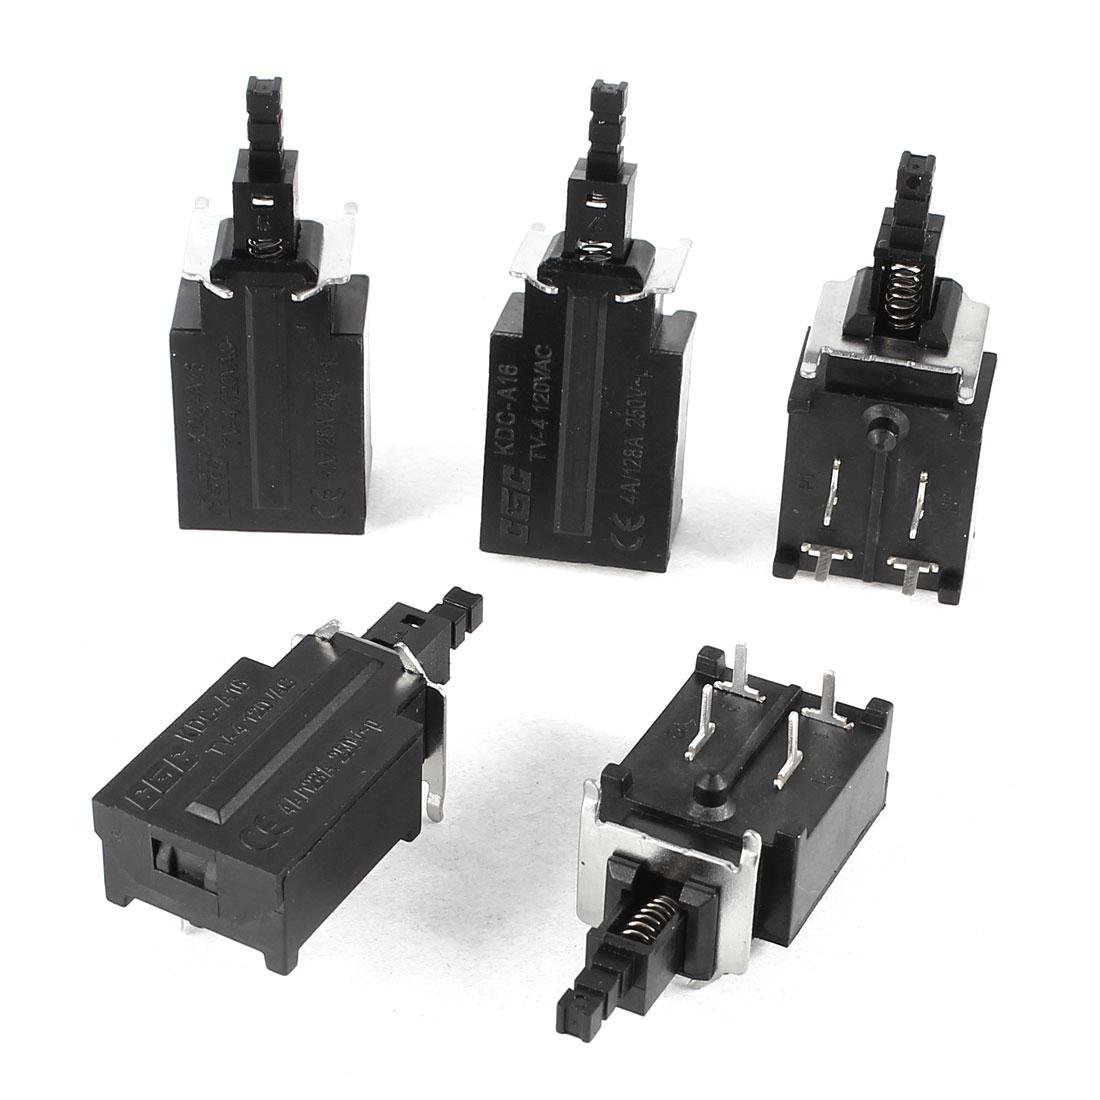 5 Pcs AC 250V 4A 4 Pin 4P SPDT Latching Push Button Power Switch Lock KDC-A16